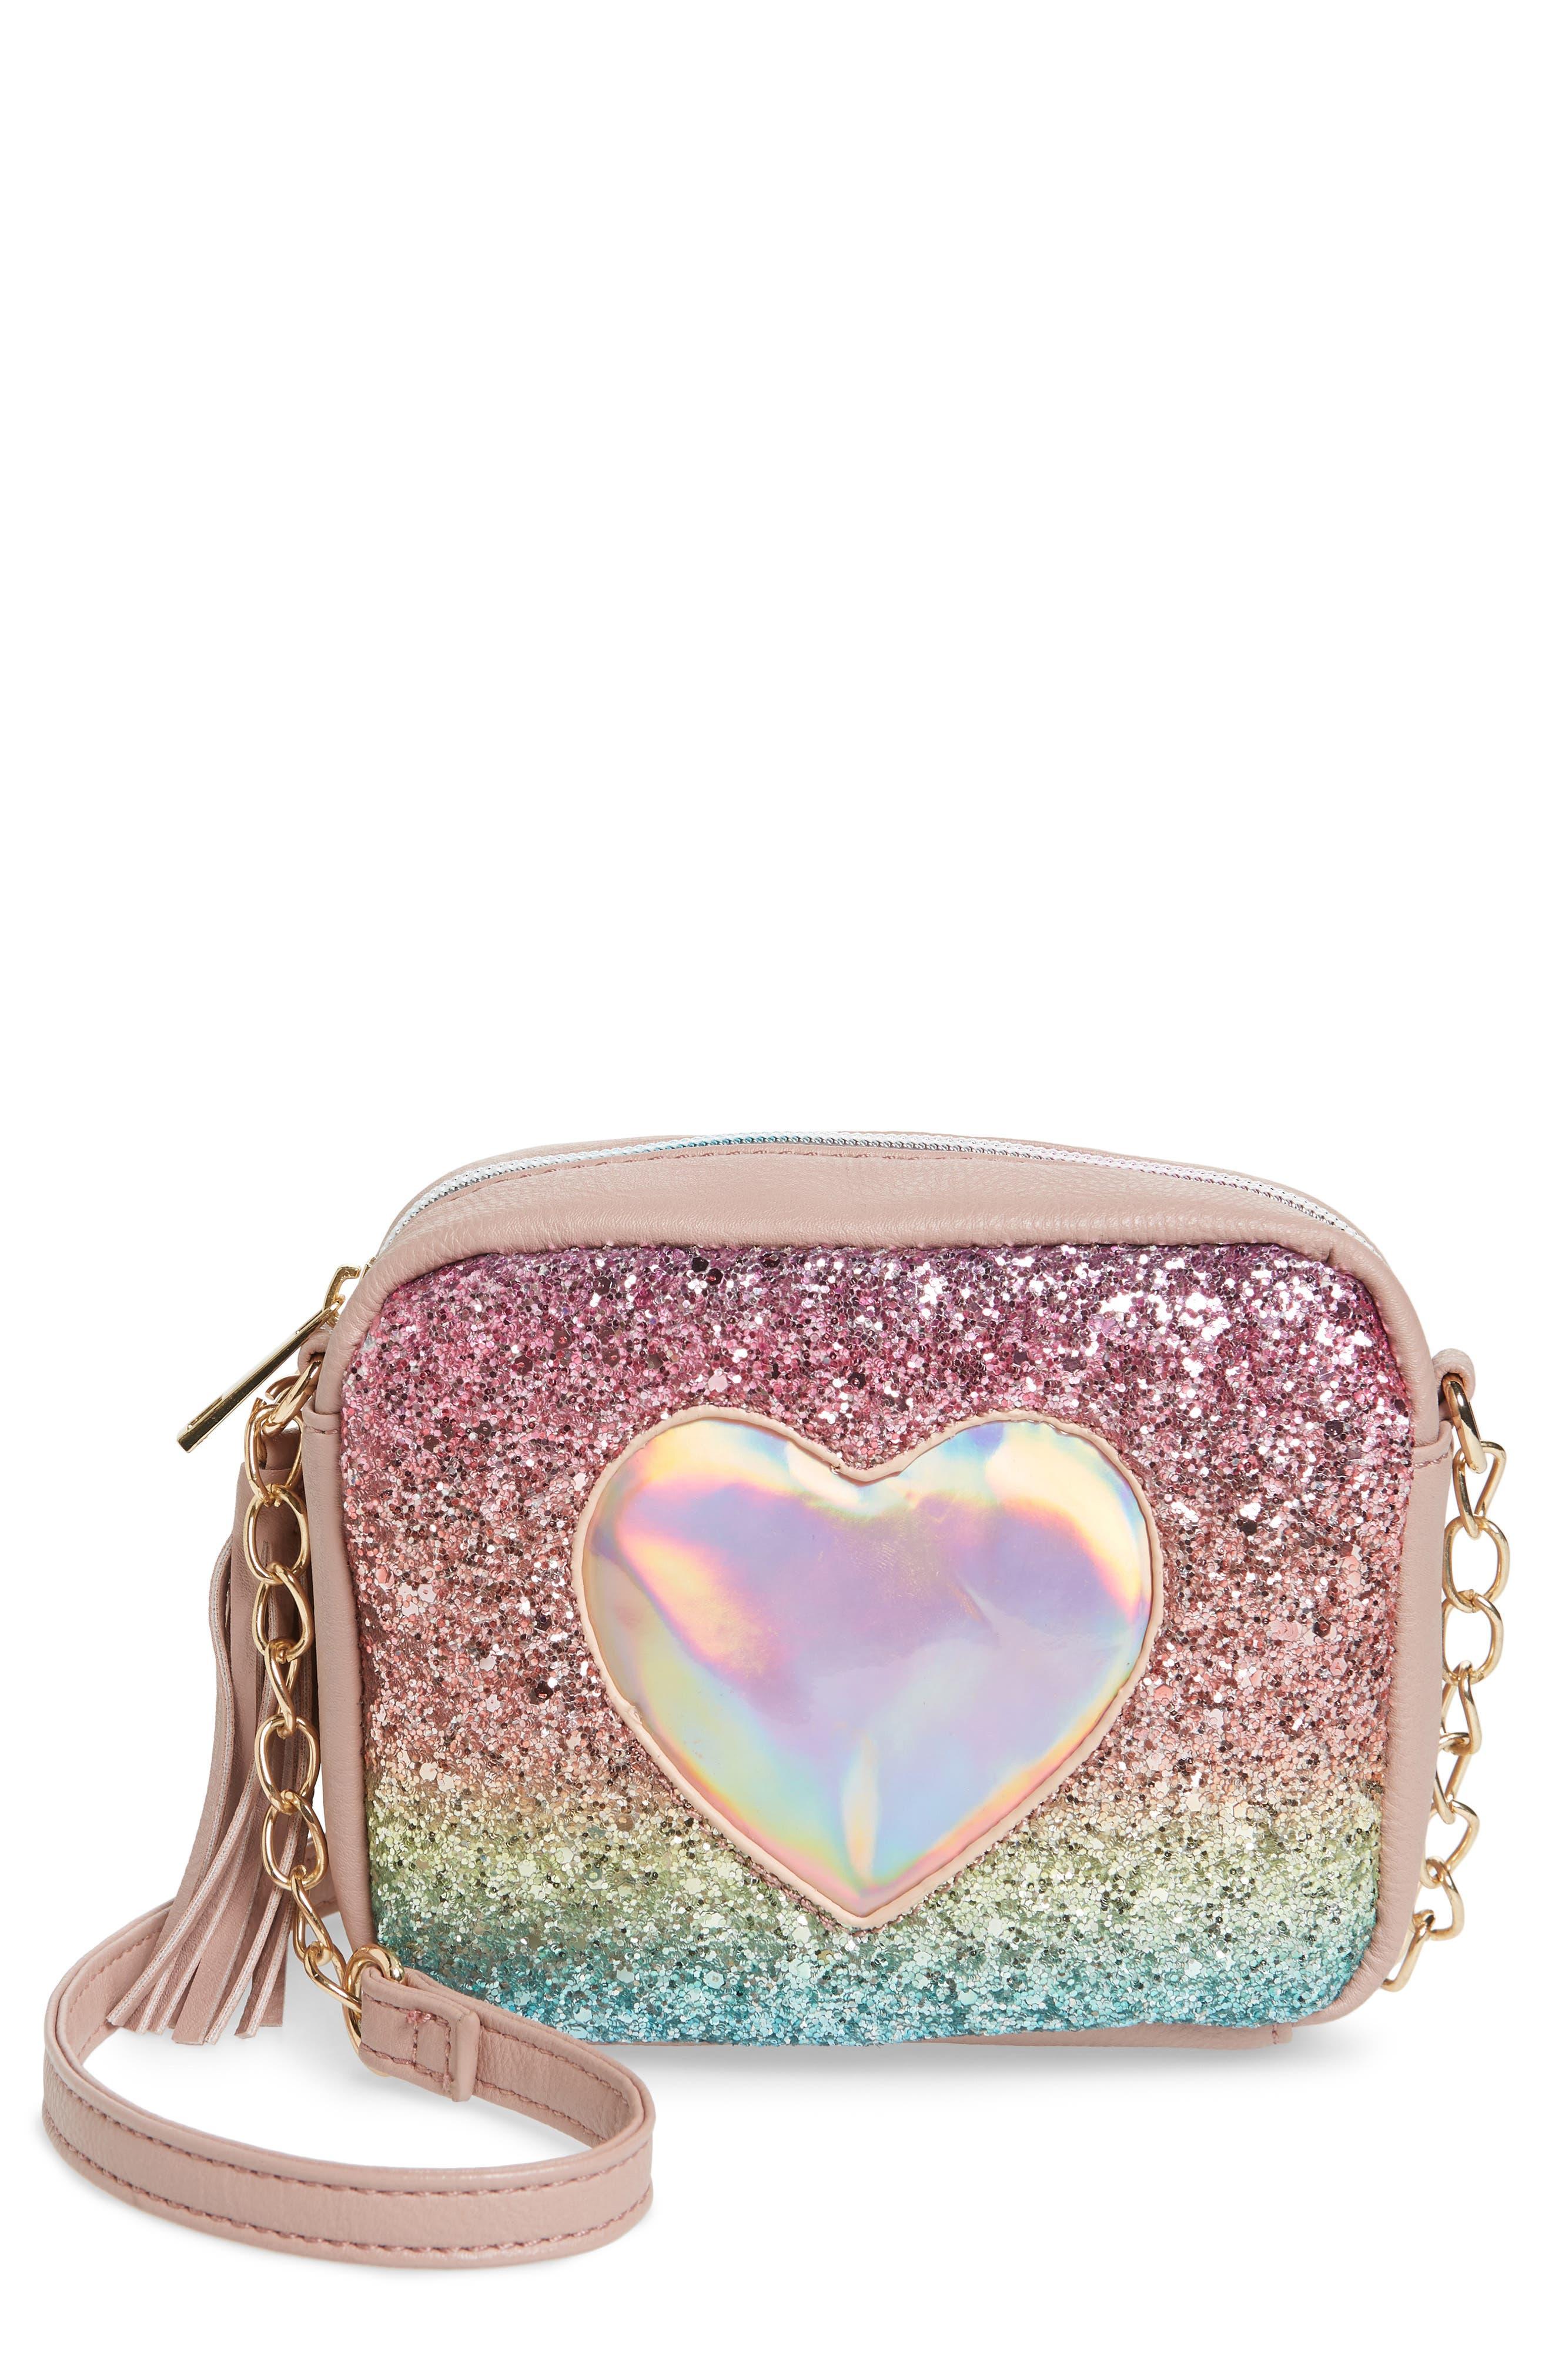 Glitter Crossbody Bag,                             Main thumbnail 1, color,                             650